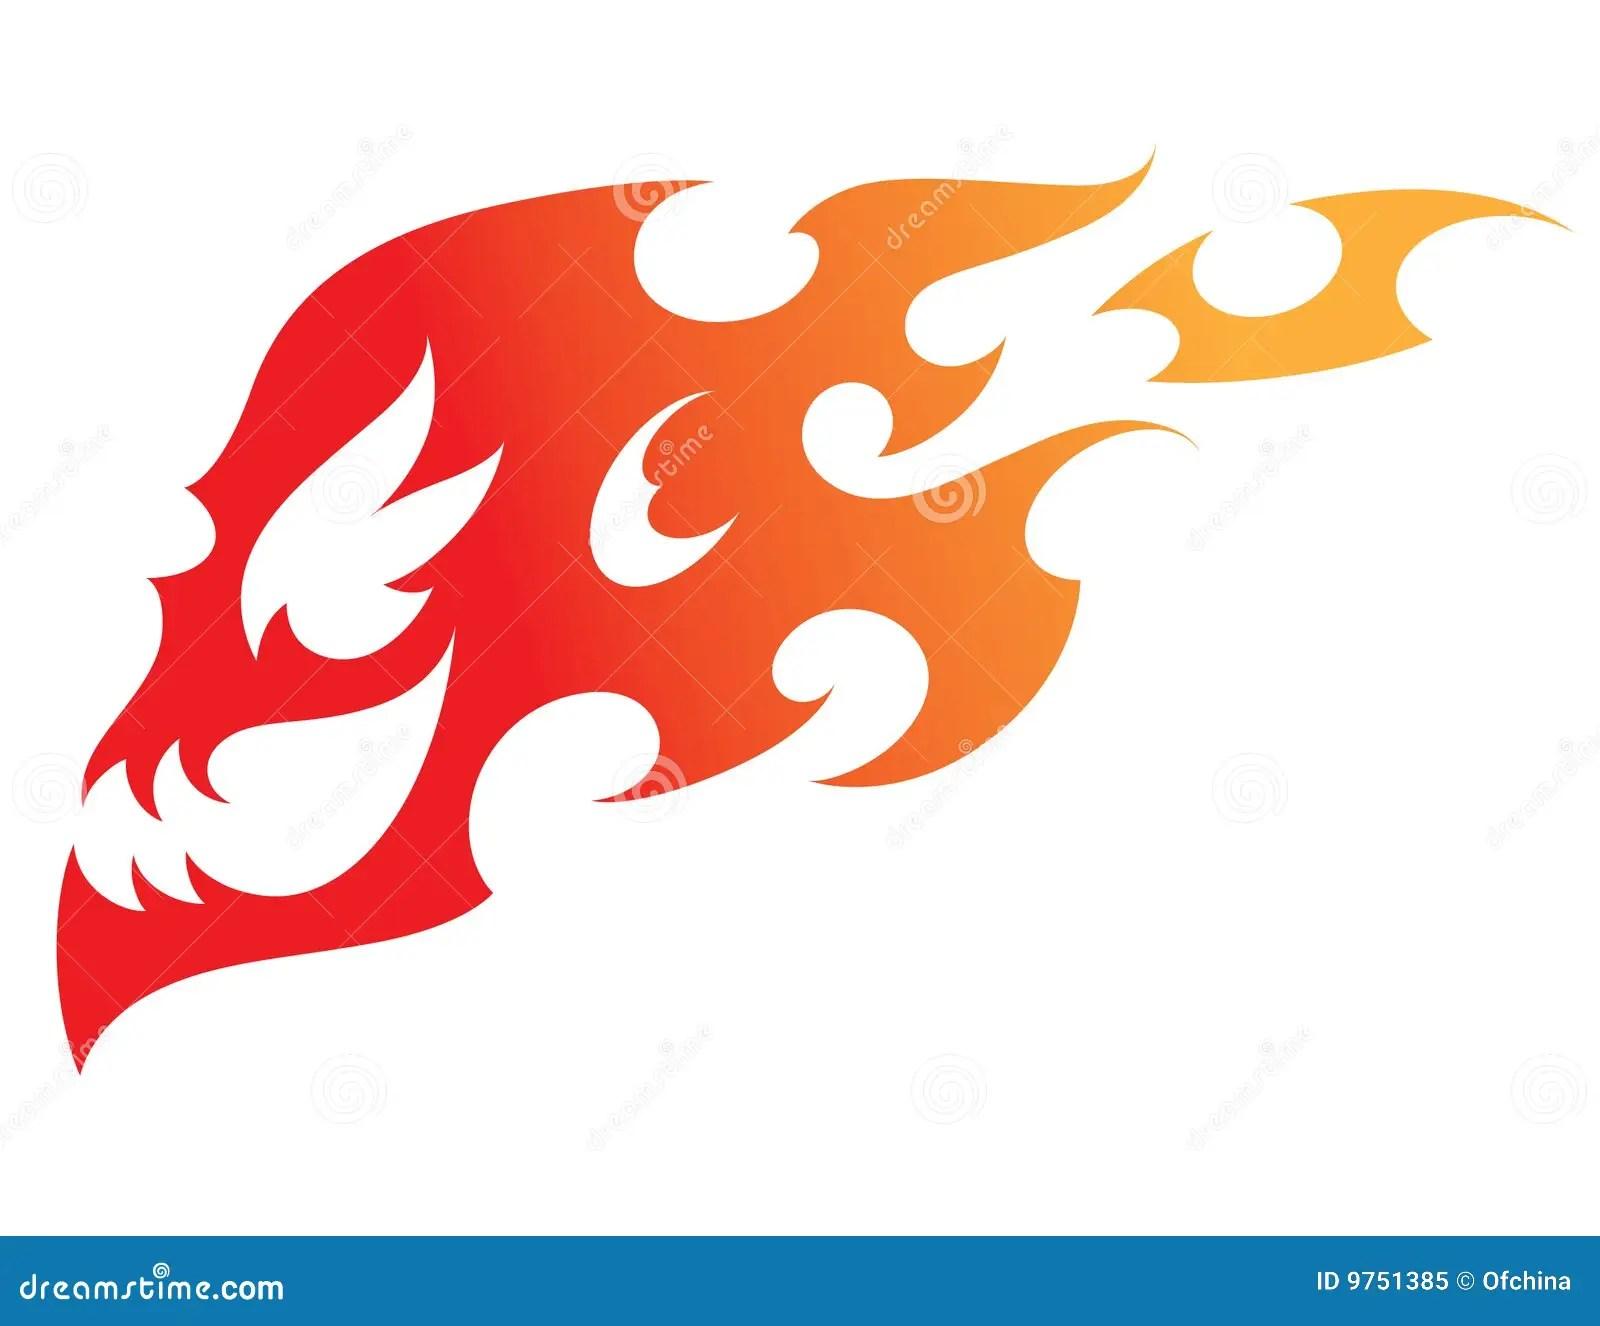 Fire Skull Royalty Free Stock Photo  Image 9751385